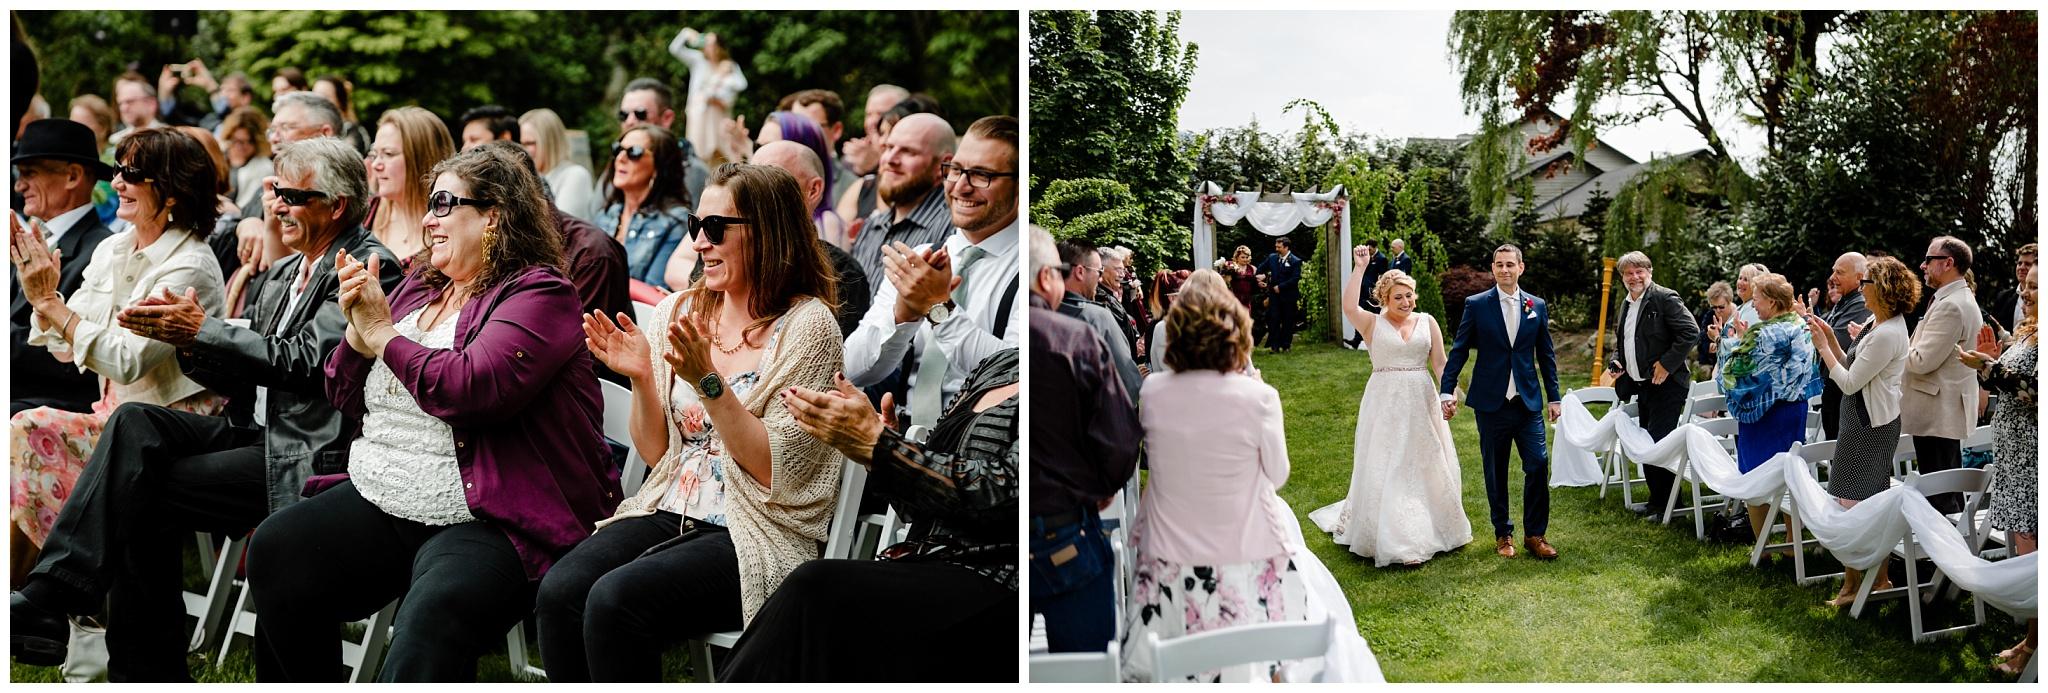 The Secret Garden at Woodbridge Ponds Abbotsford Wedding Venue Photography Fun Candid Happy Pink Purple  Real_0012.jpg